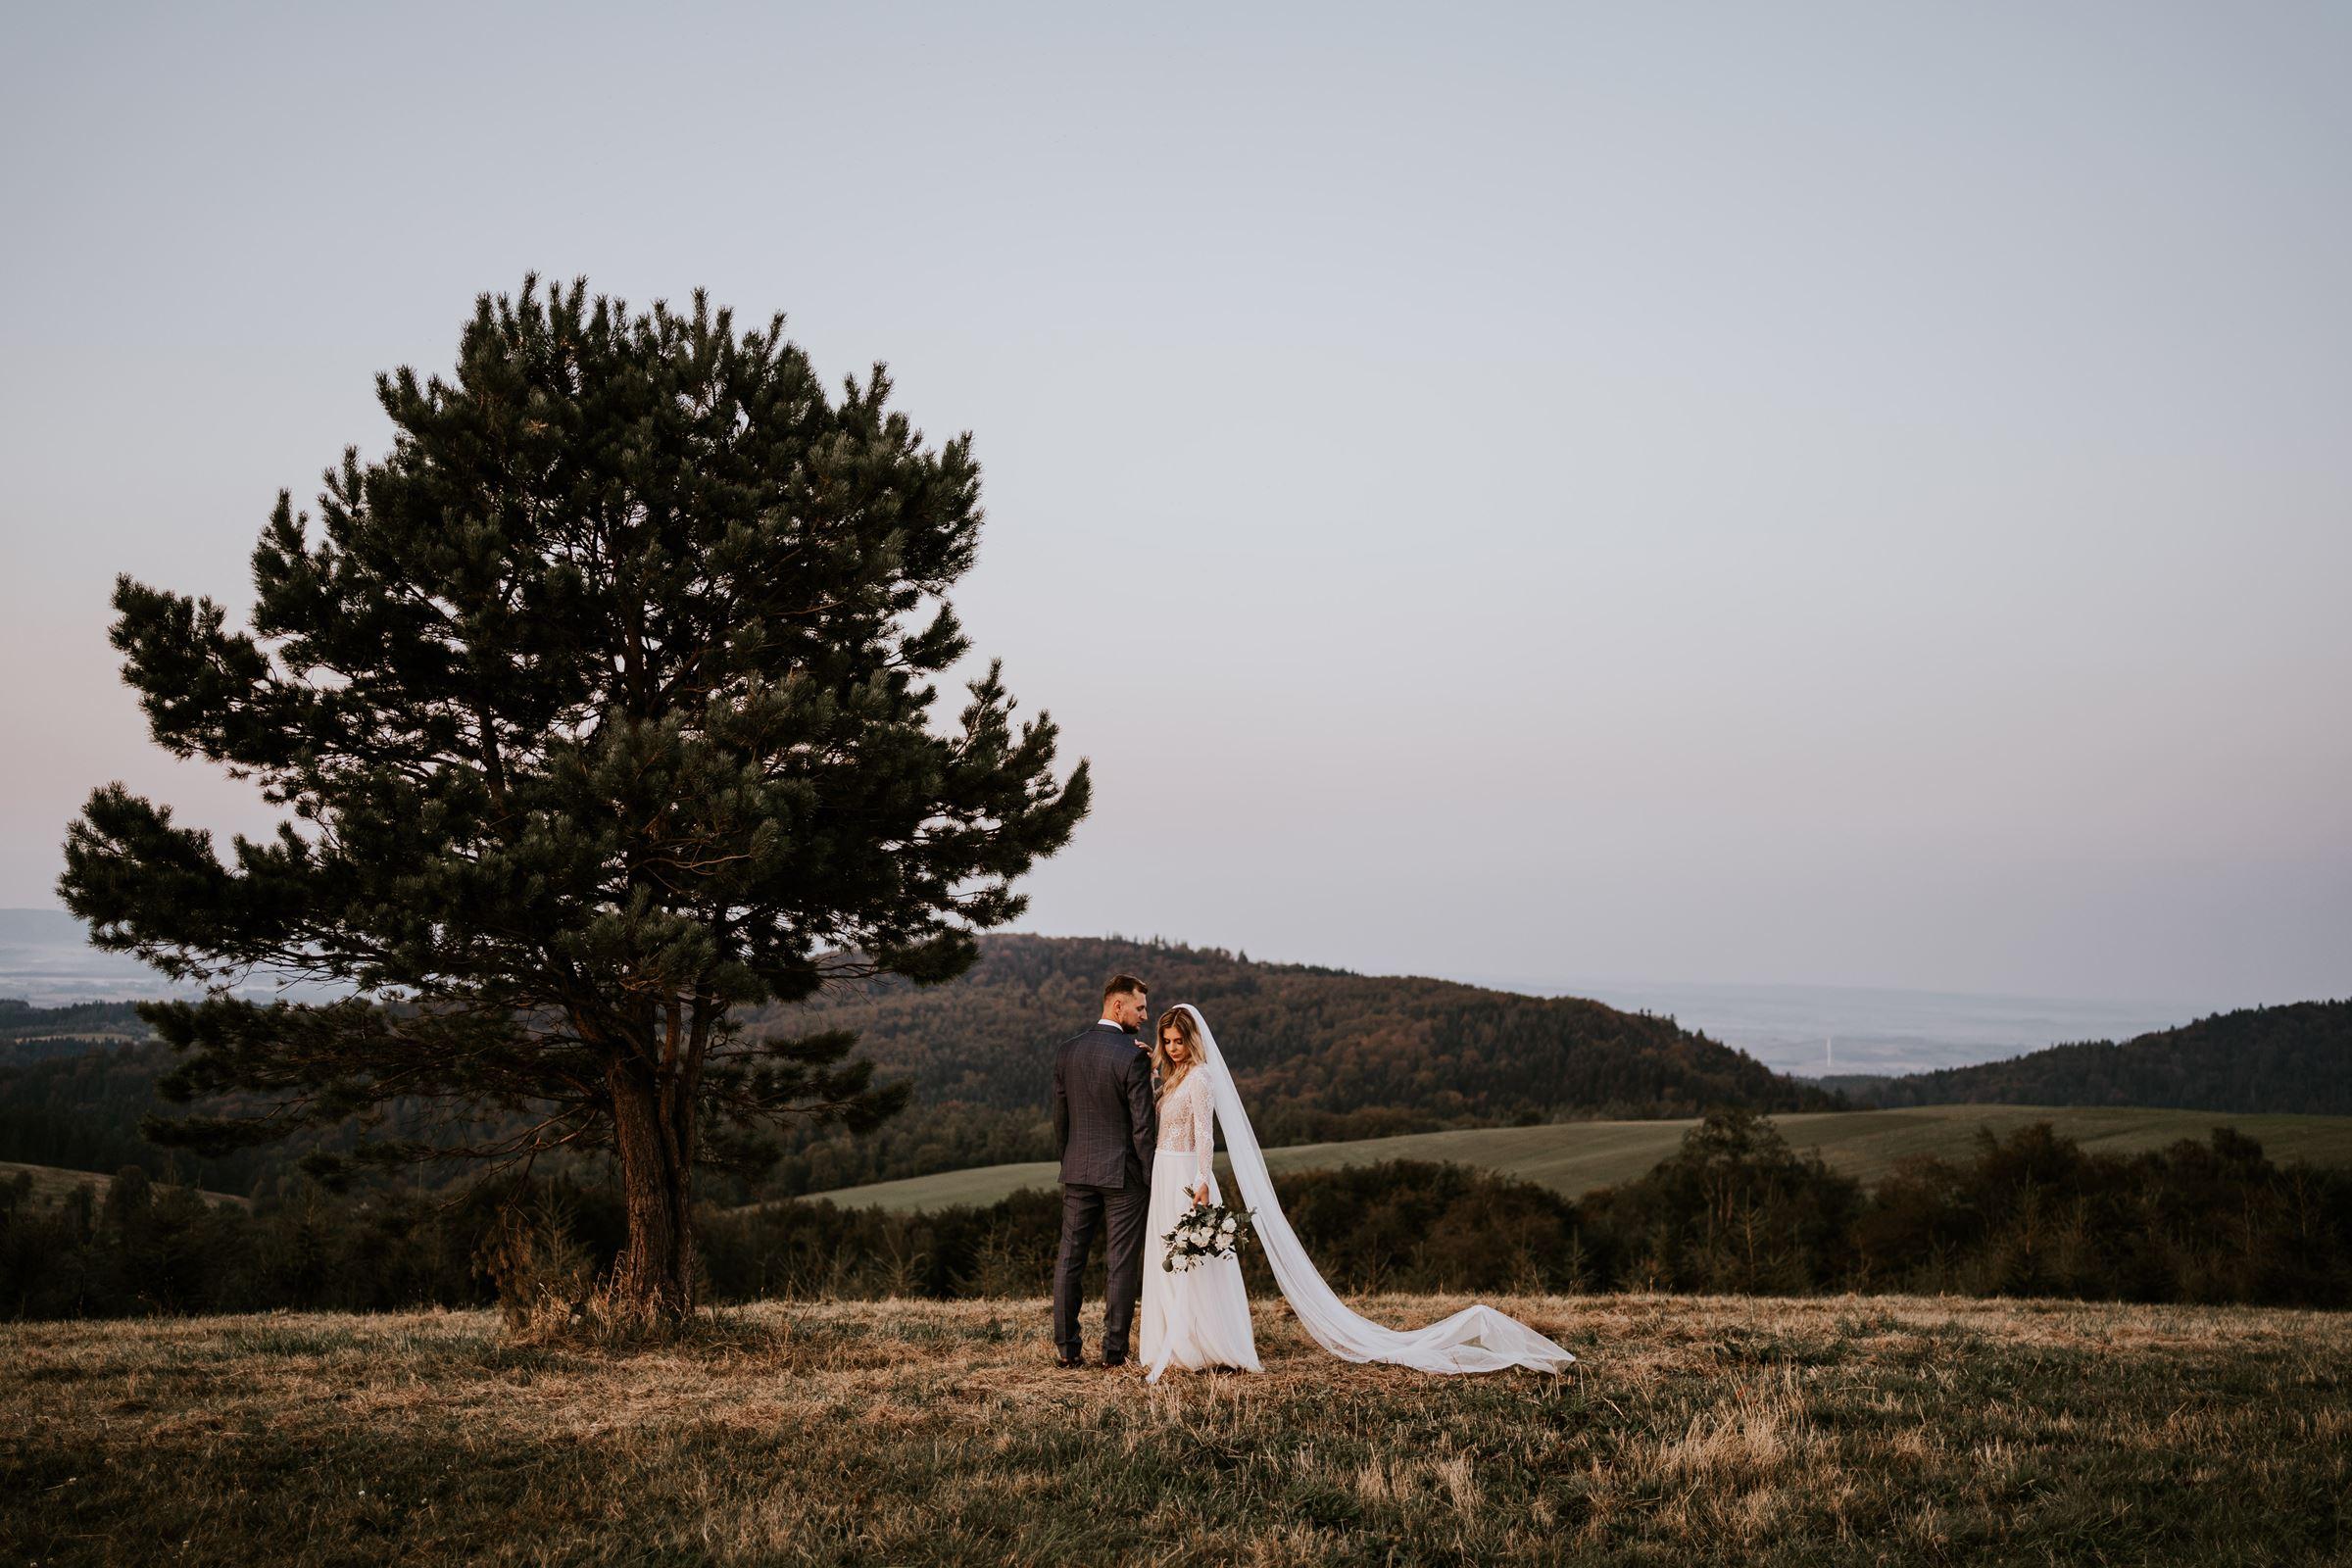 Joanna + Michał | Zachód słońca na wzgórzu